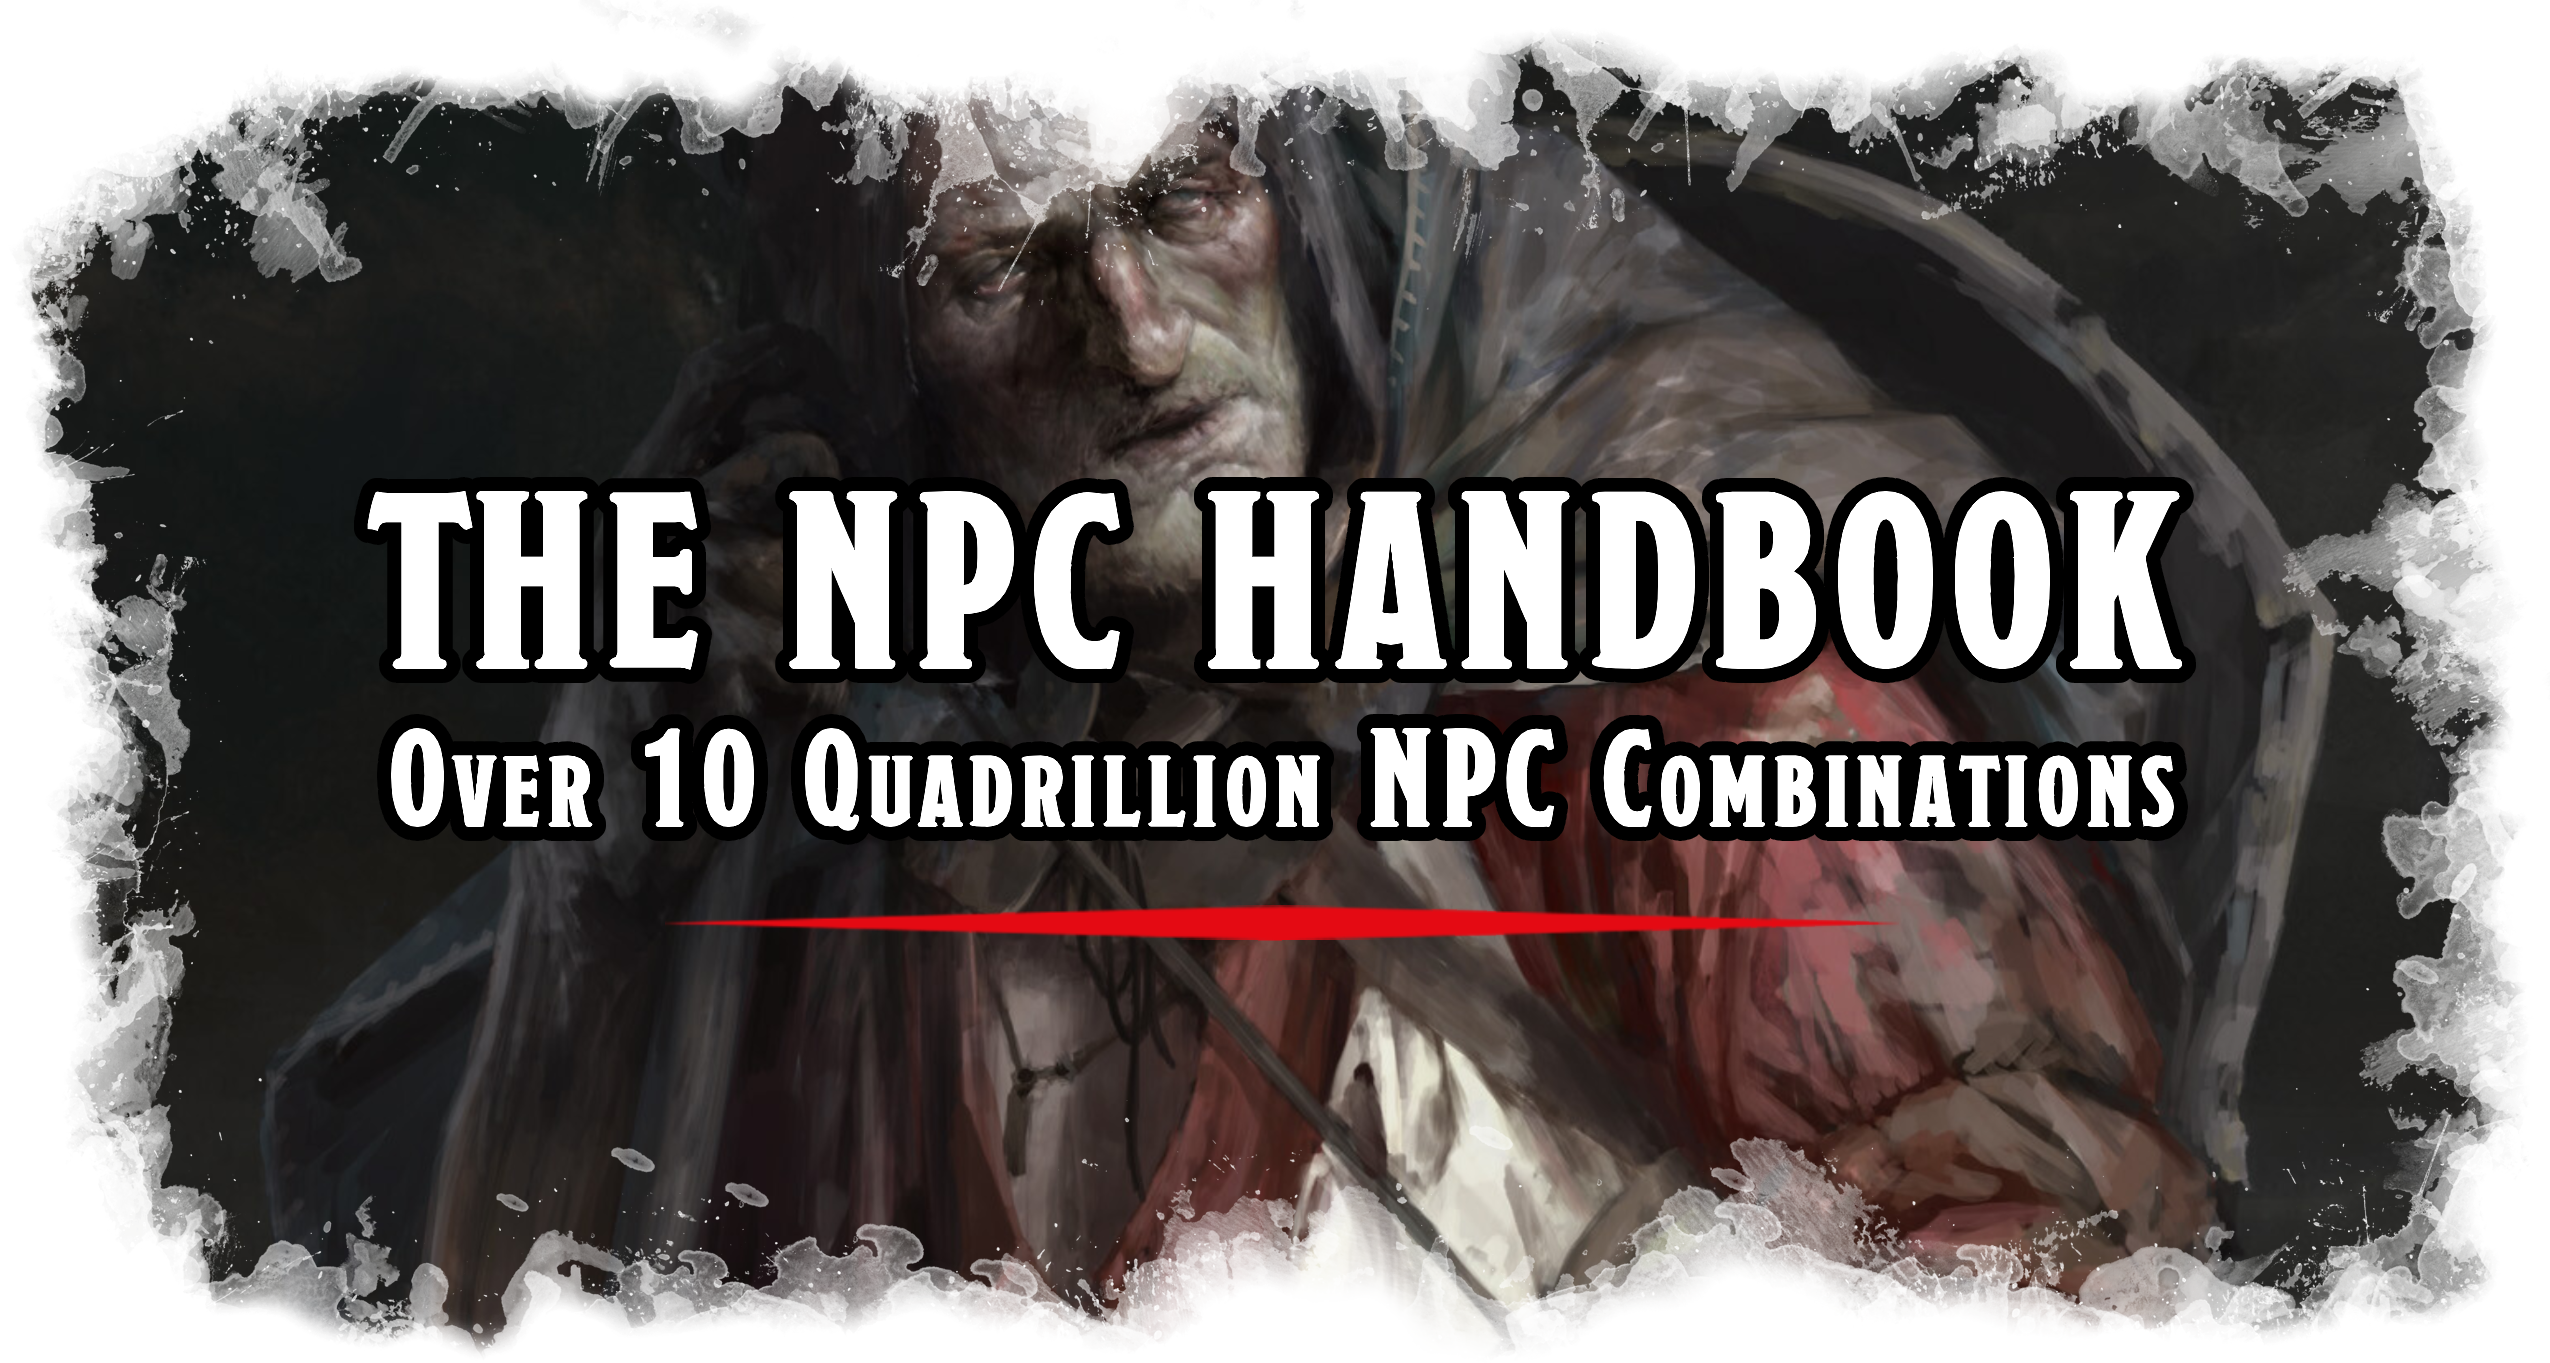 https://i.ibb.co/cNmWTP1/The-NPC-Handbook-banner.png